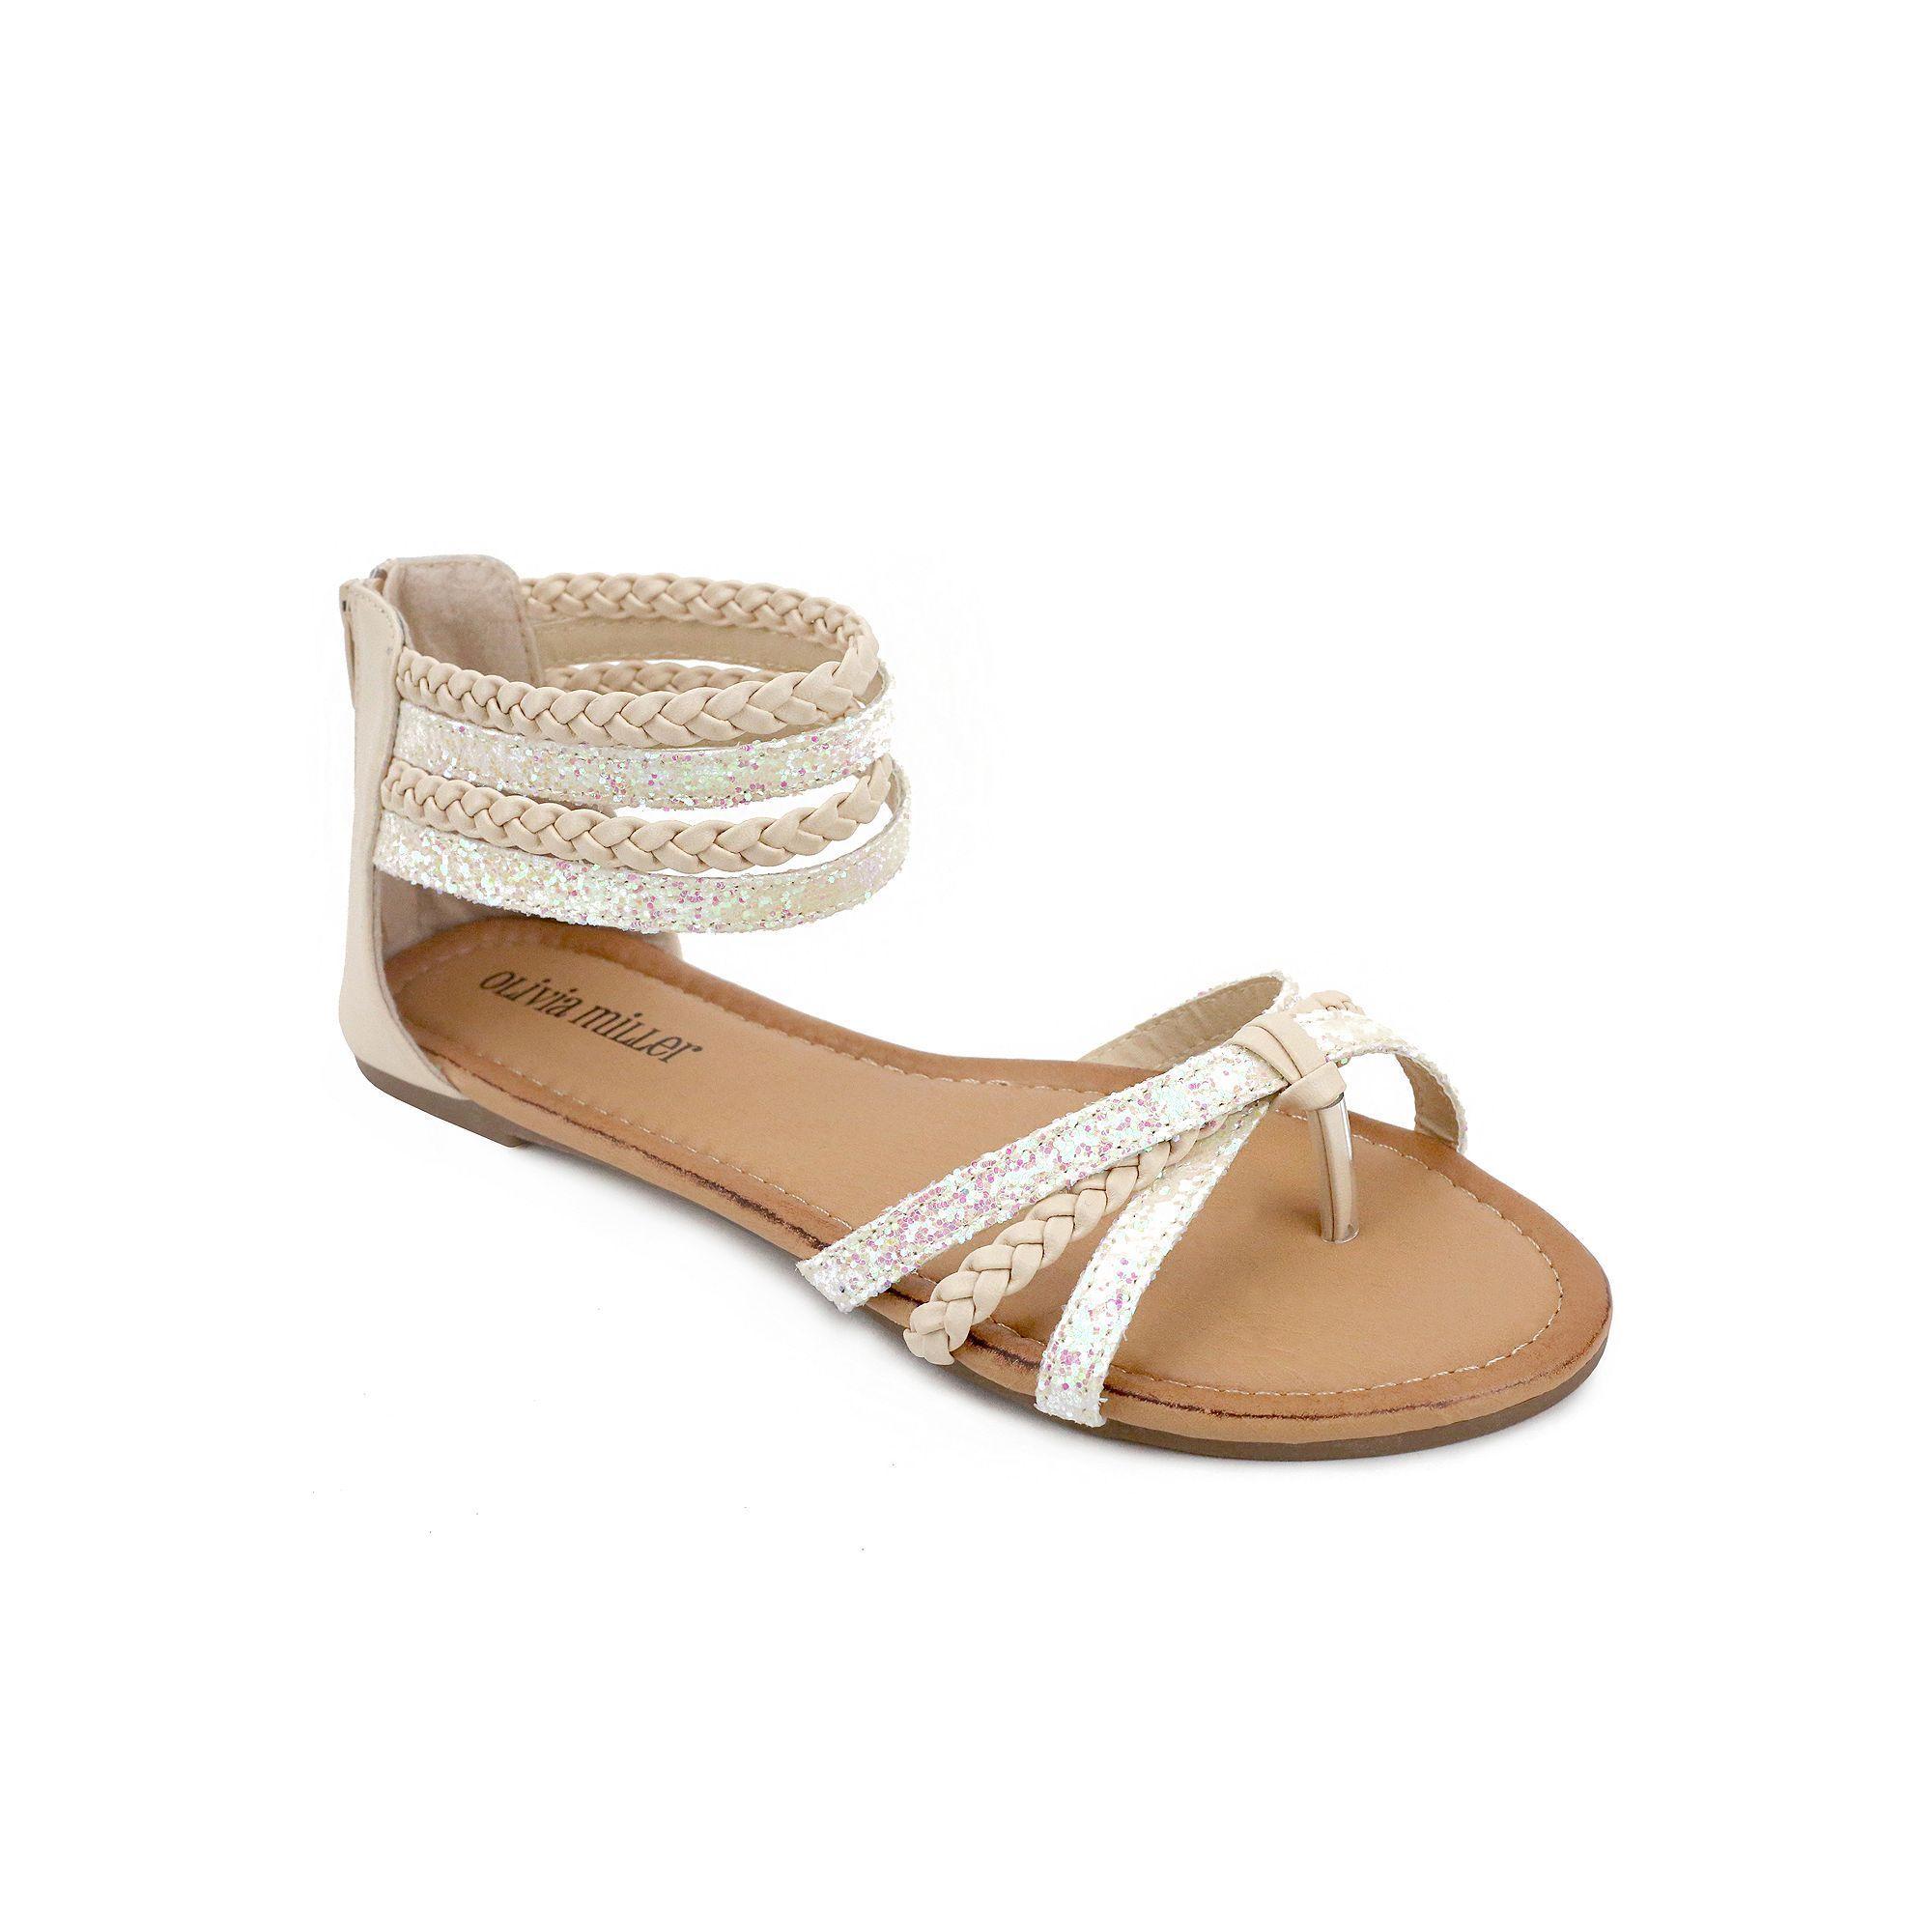 Olivia Miller Tara Women's ... Sandals pick a best online sJRM9